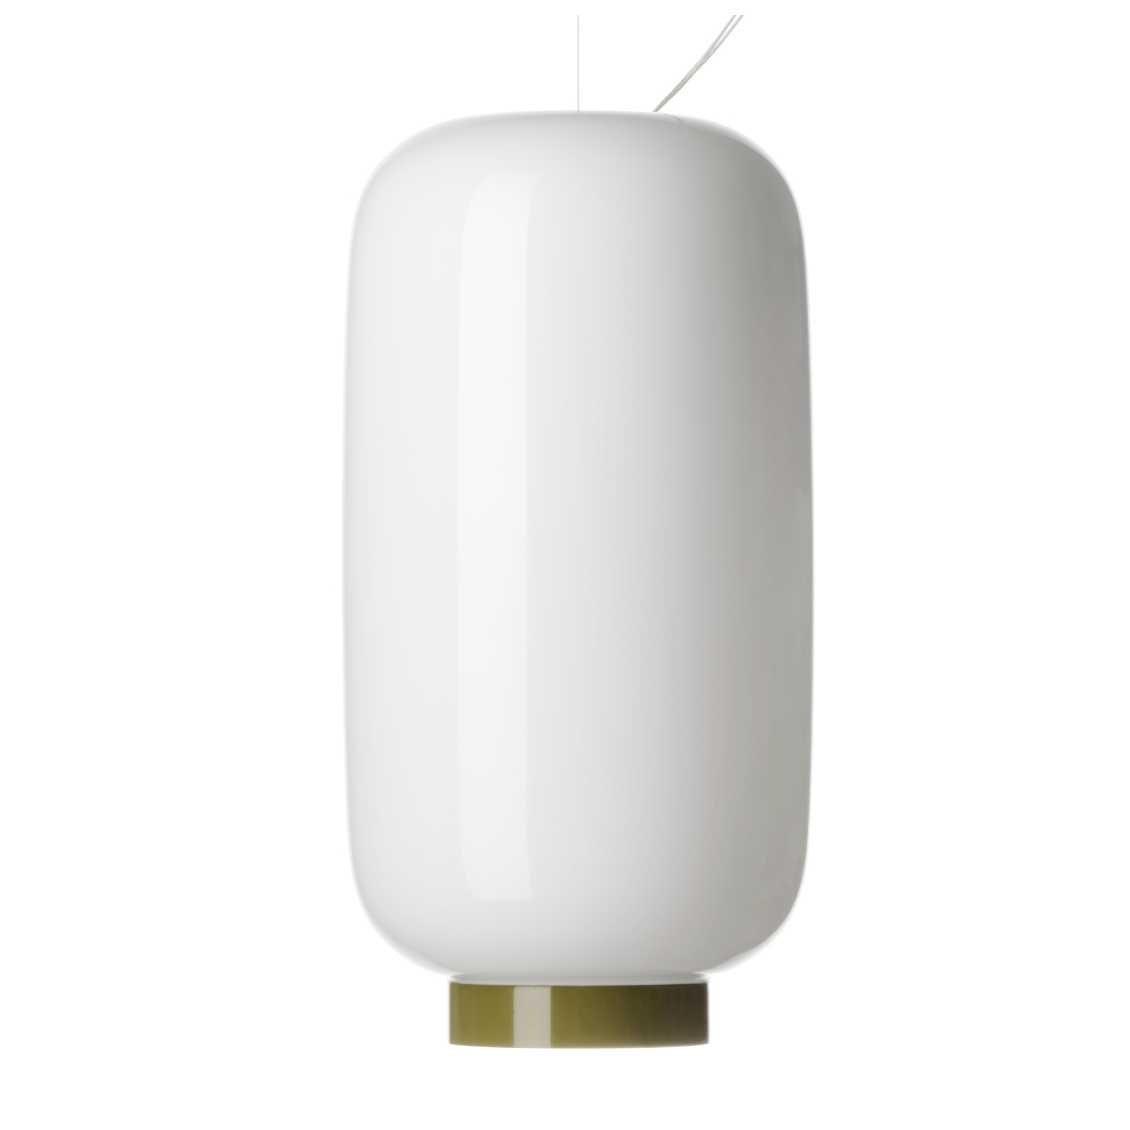 Foscarini Chouchin 2 Reverse Hanglamp LED Dimbaar - Kabel 10m